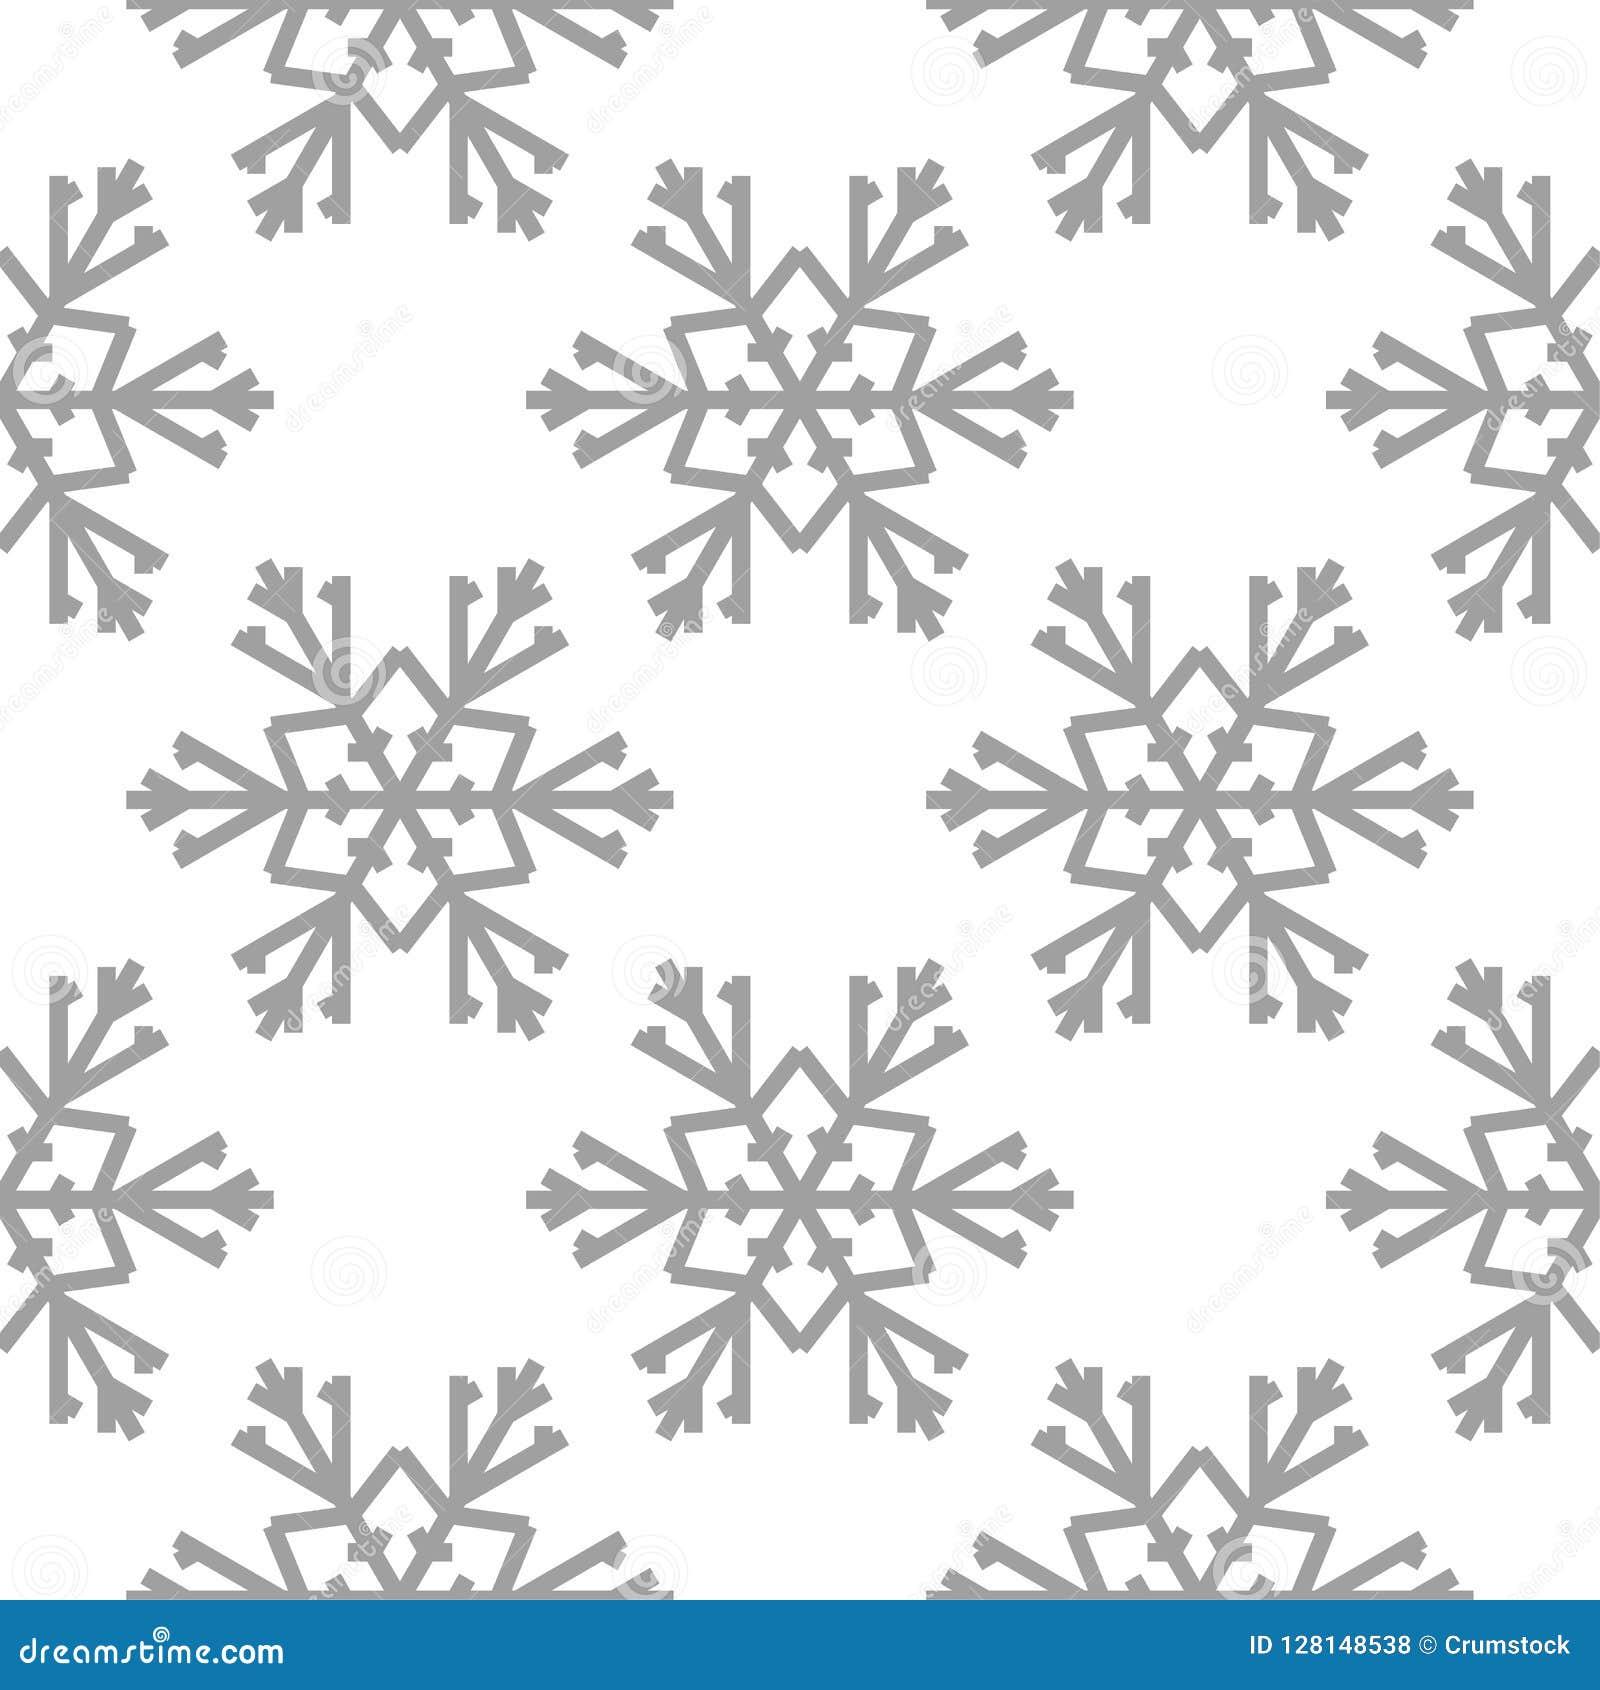 Snowflakes πρότυπο άνευ ραφής Άσπρη και γκρίζα χειμερινή διακόσμηση